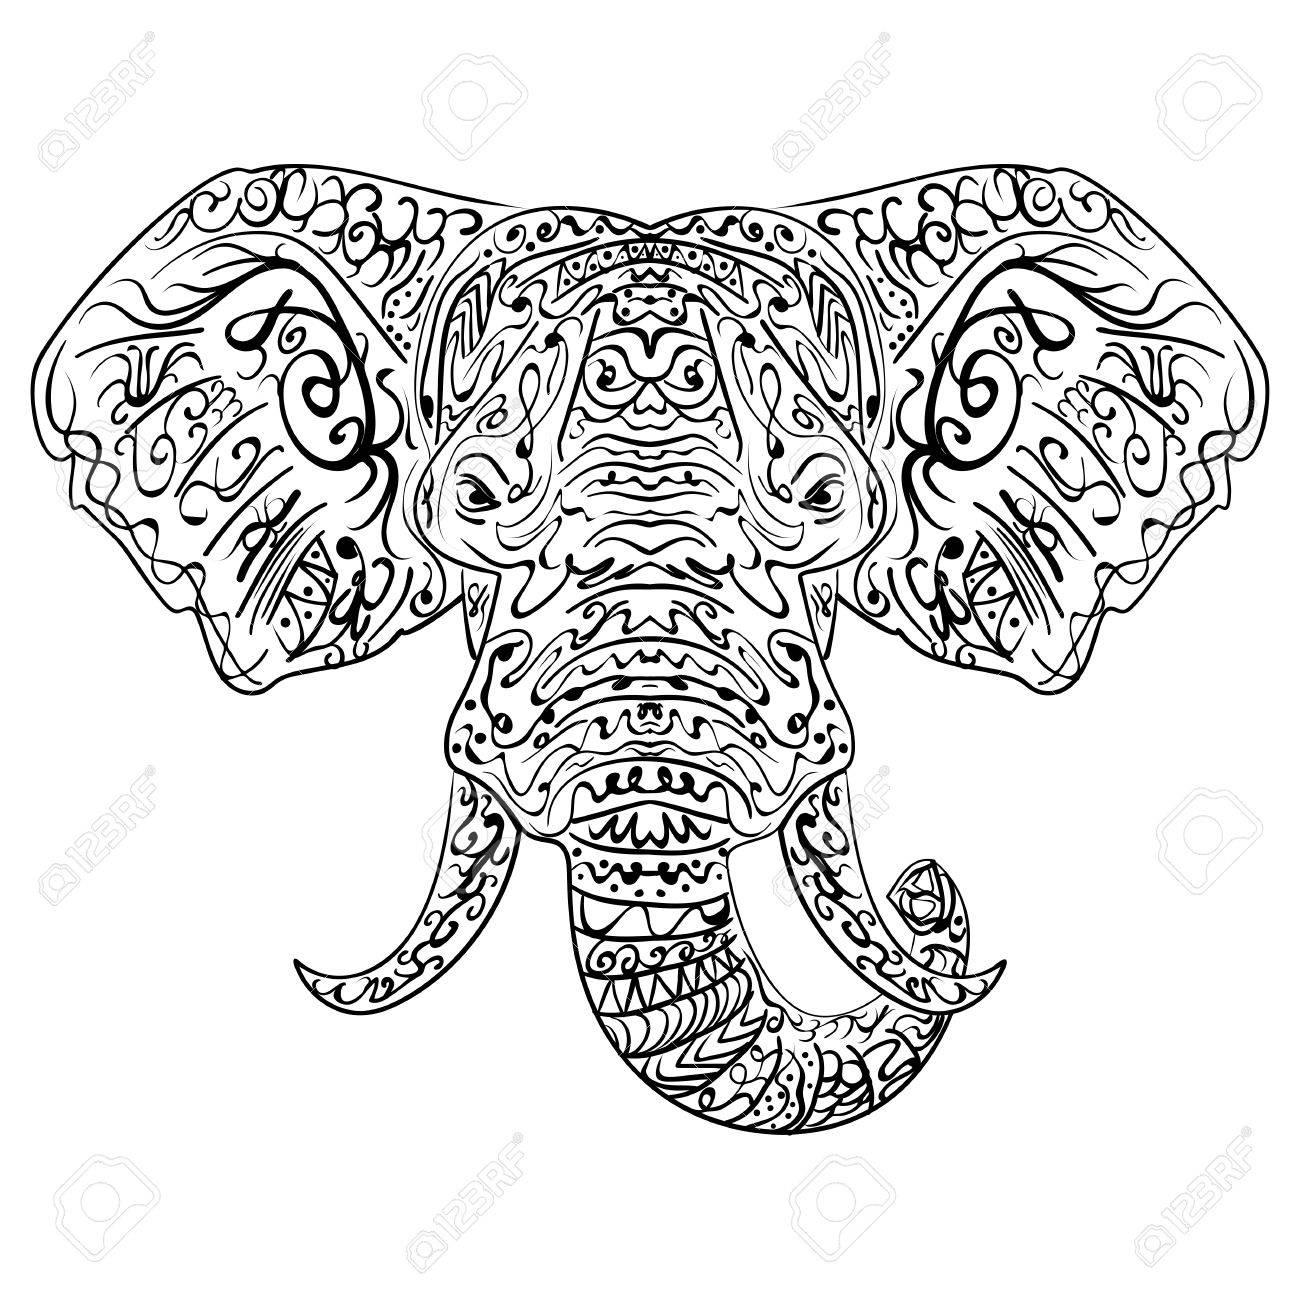 1300x1300 Ethnic Indian Elephant Boho Paisley. Freehand Sketch For Adult